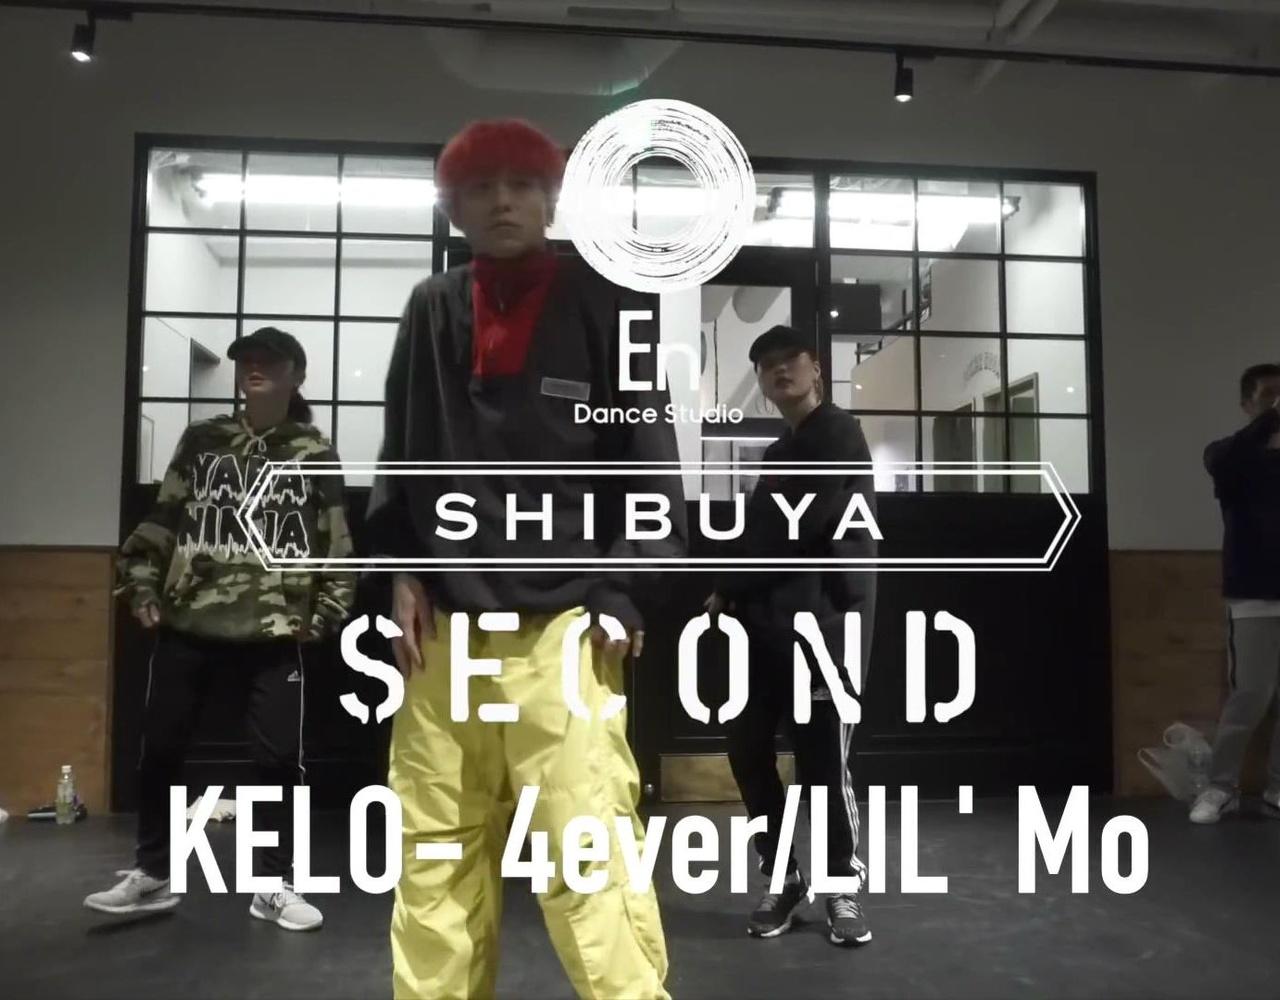 【流畅编舞】【En舞室】KELO编舞4ever-LIL' Mo